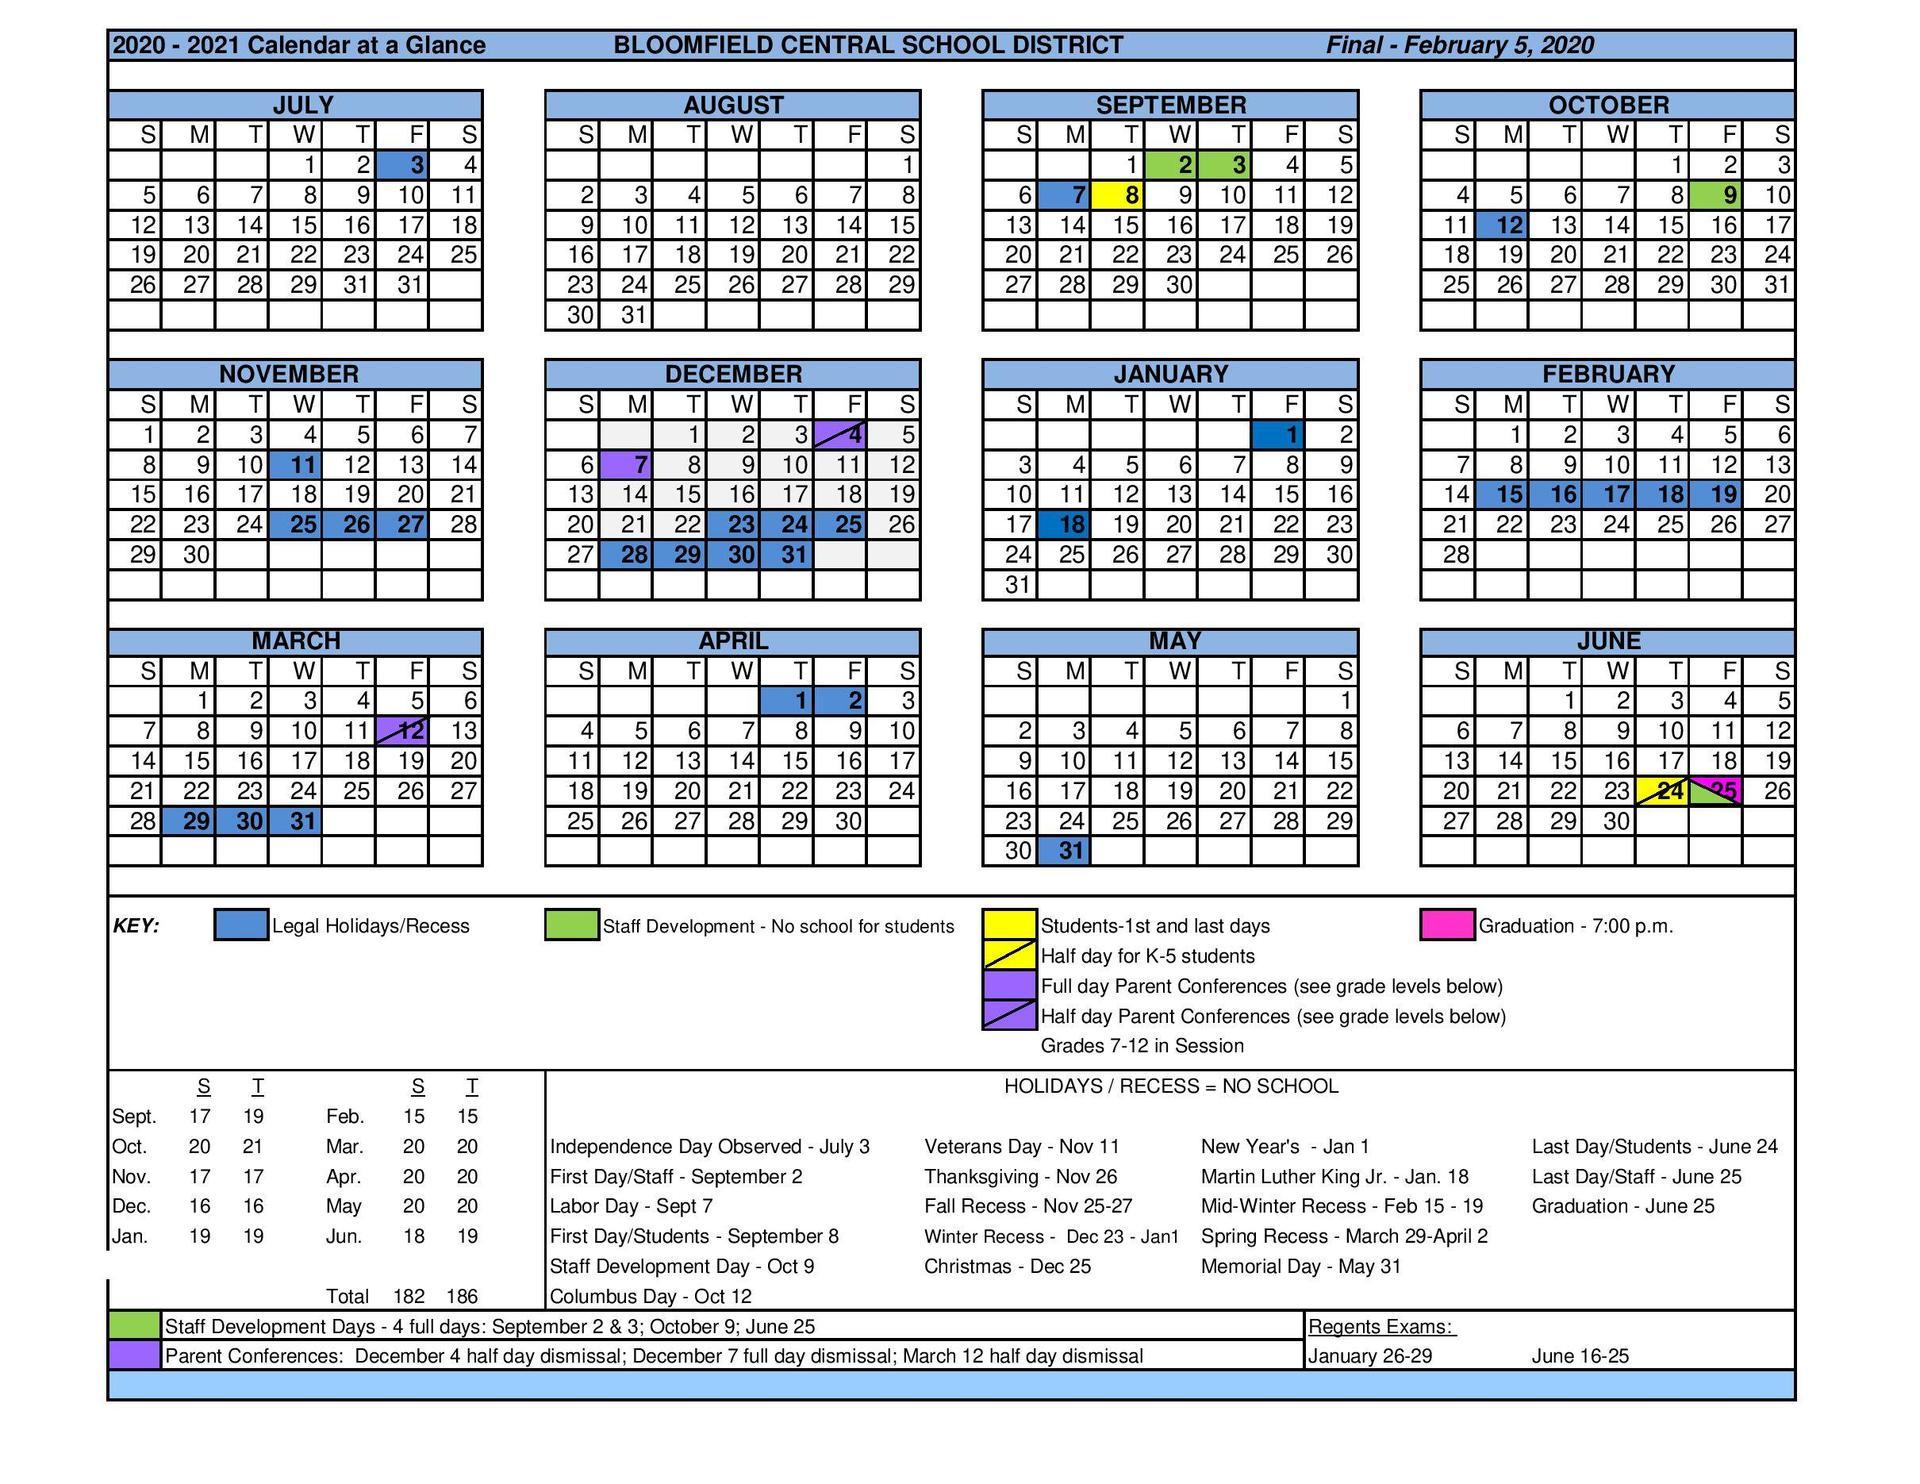 image of calendar pdf